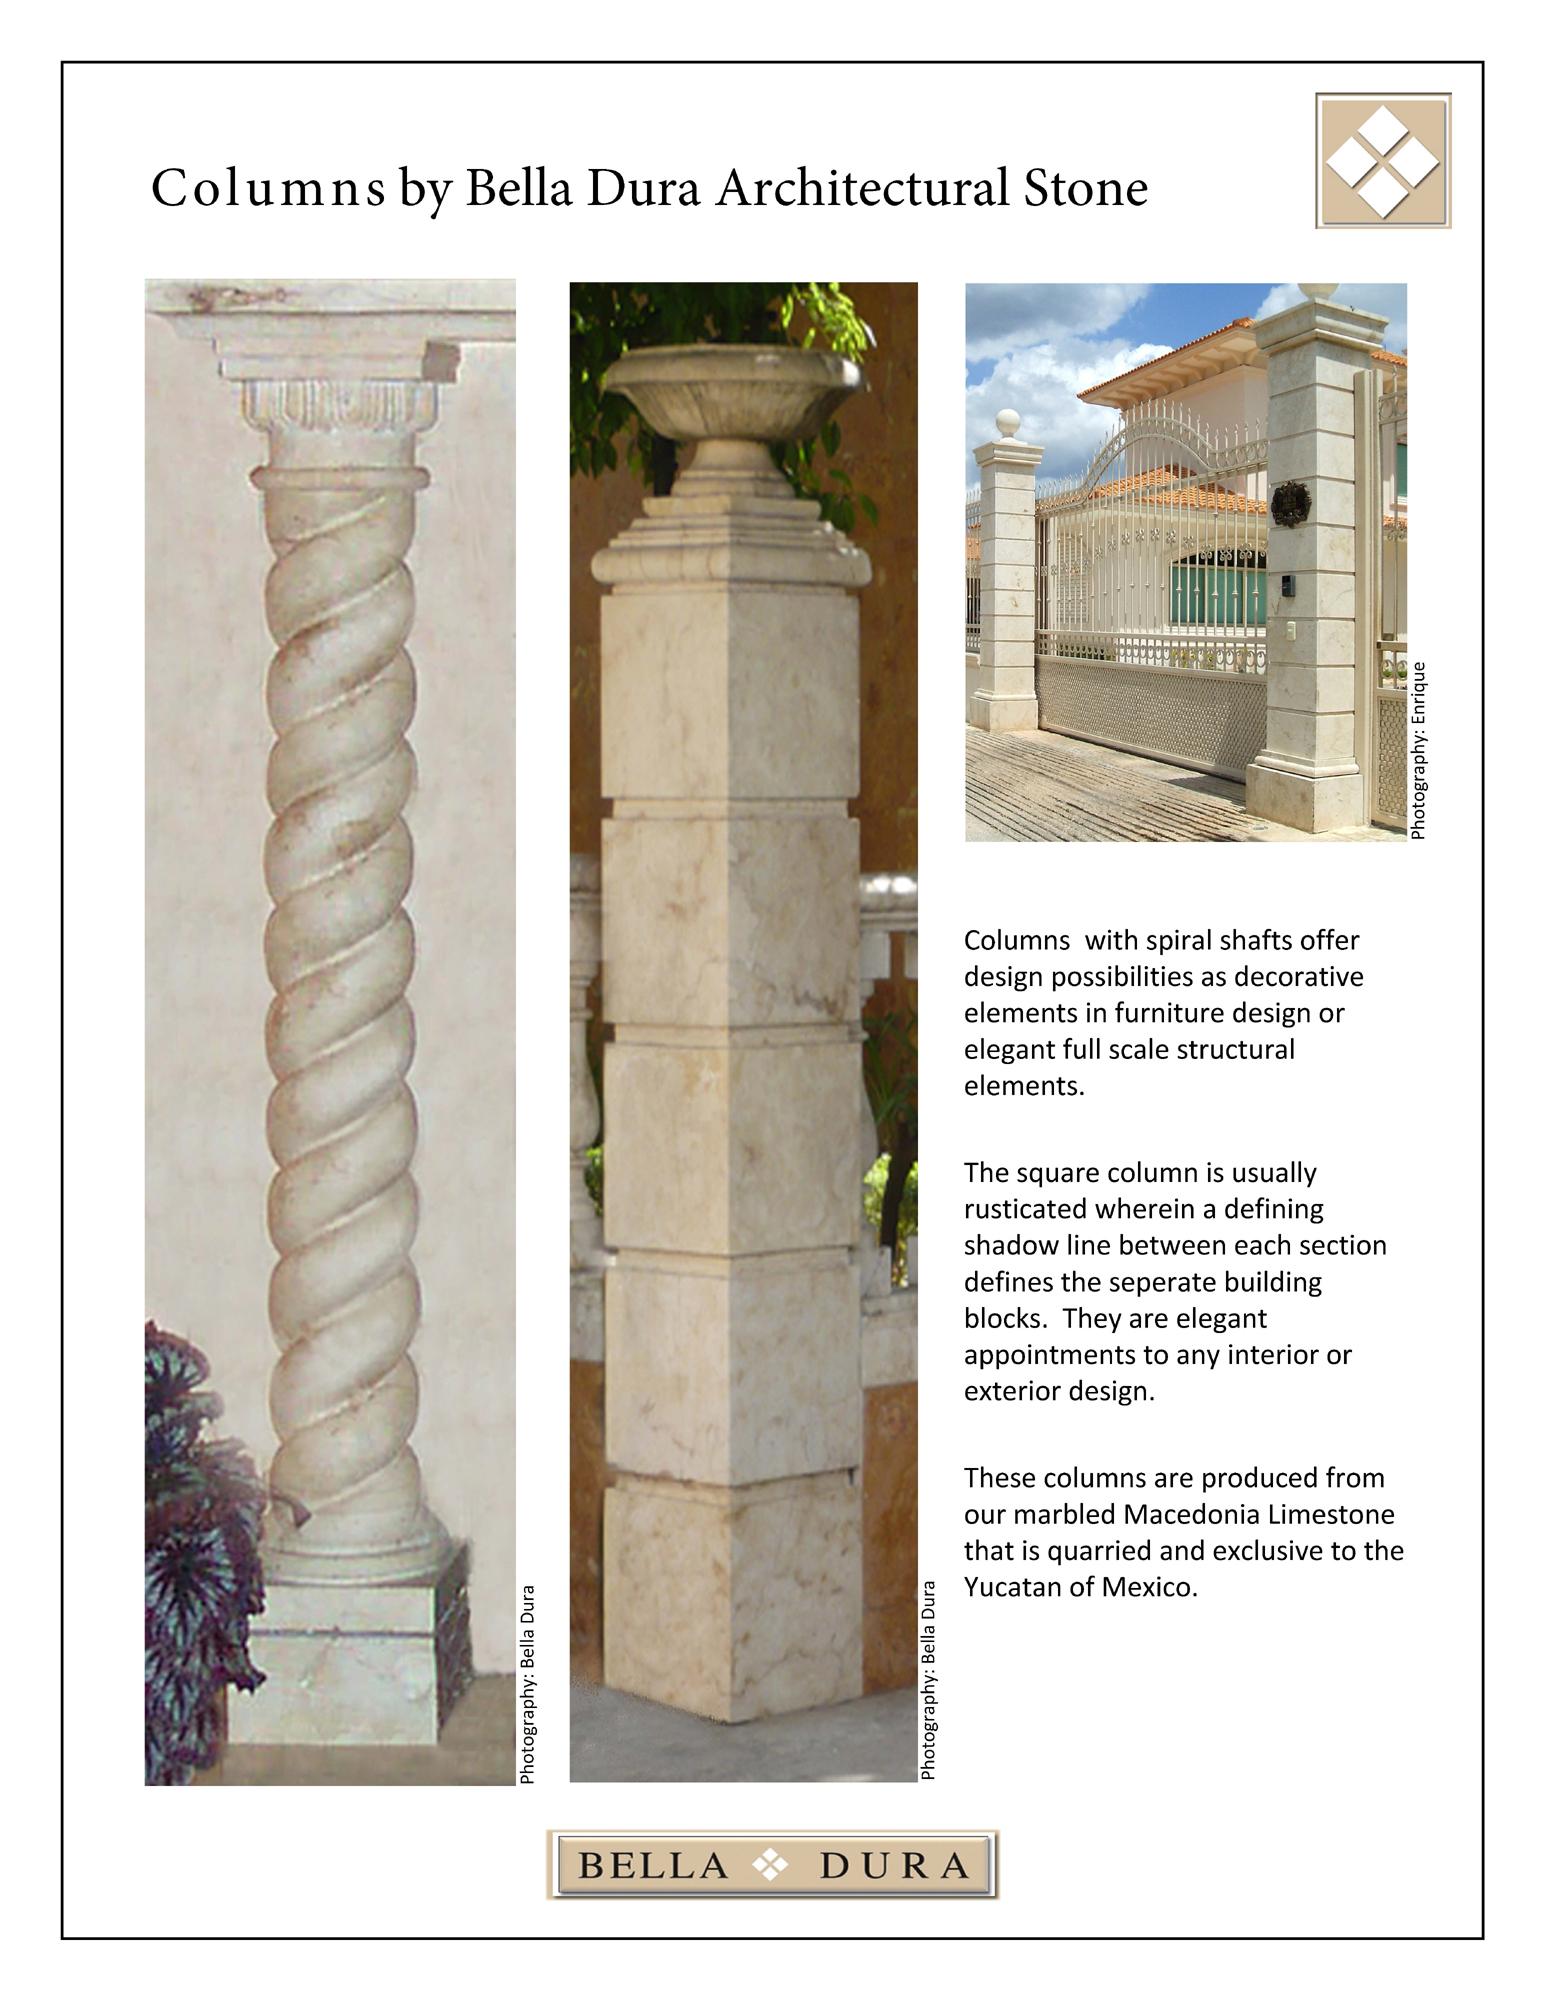 1.Bella Dura Architectural Stone 3, 2014 - DEC. 16, 2014. Copy 13S_Columns & Pilasters1545x2000_5.jpg